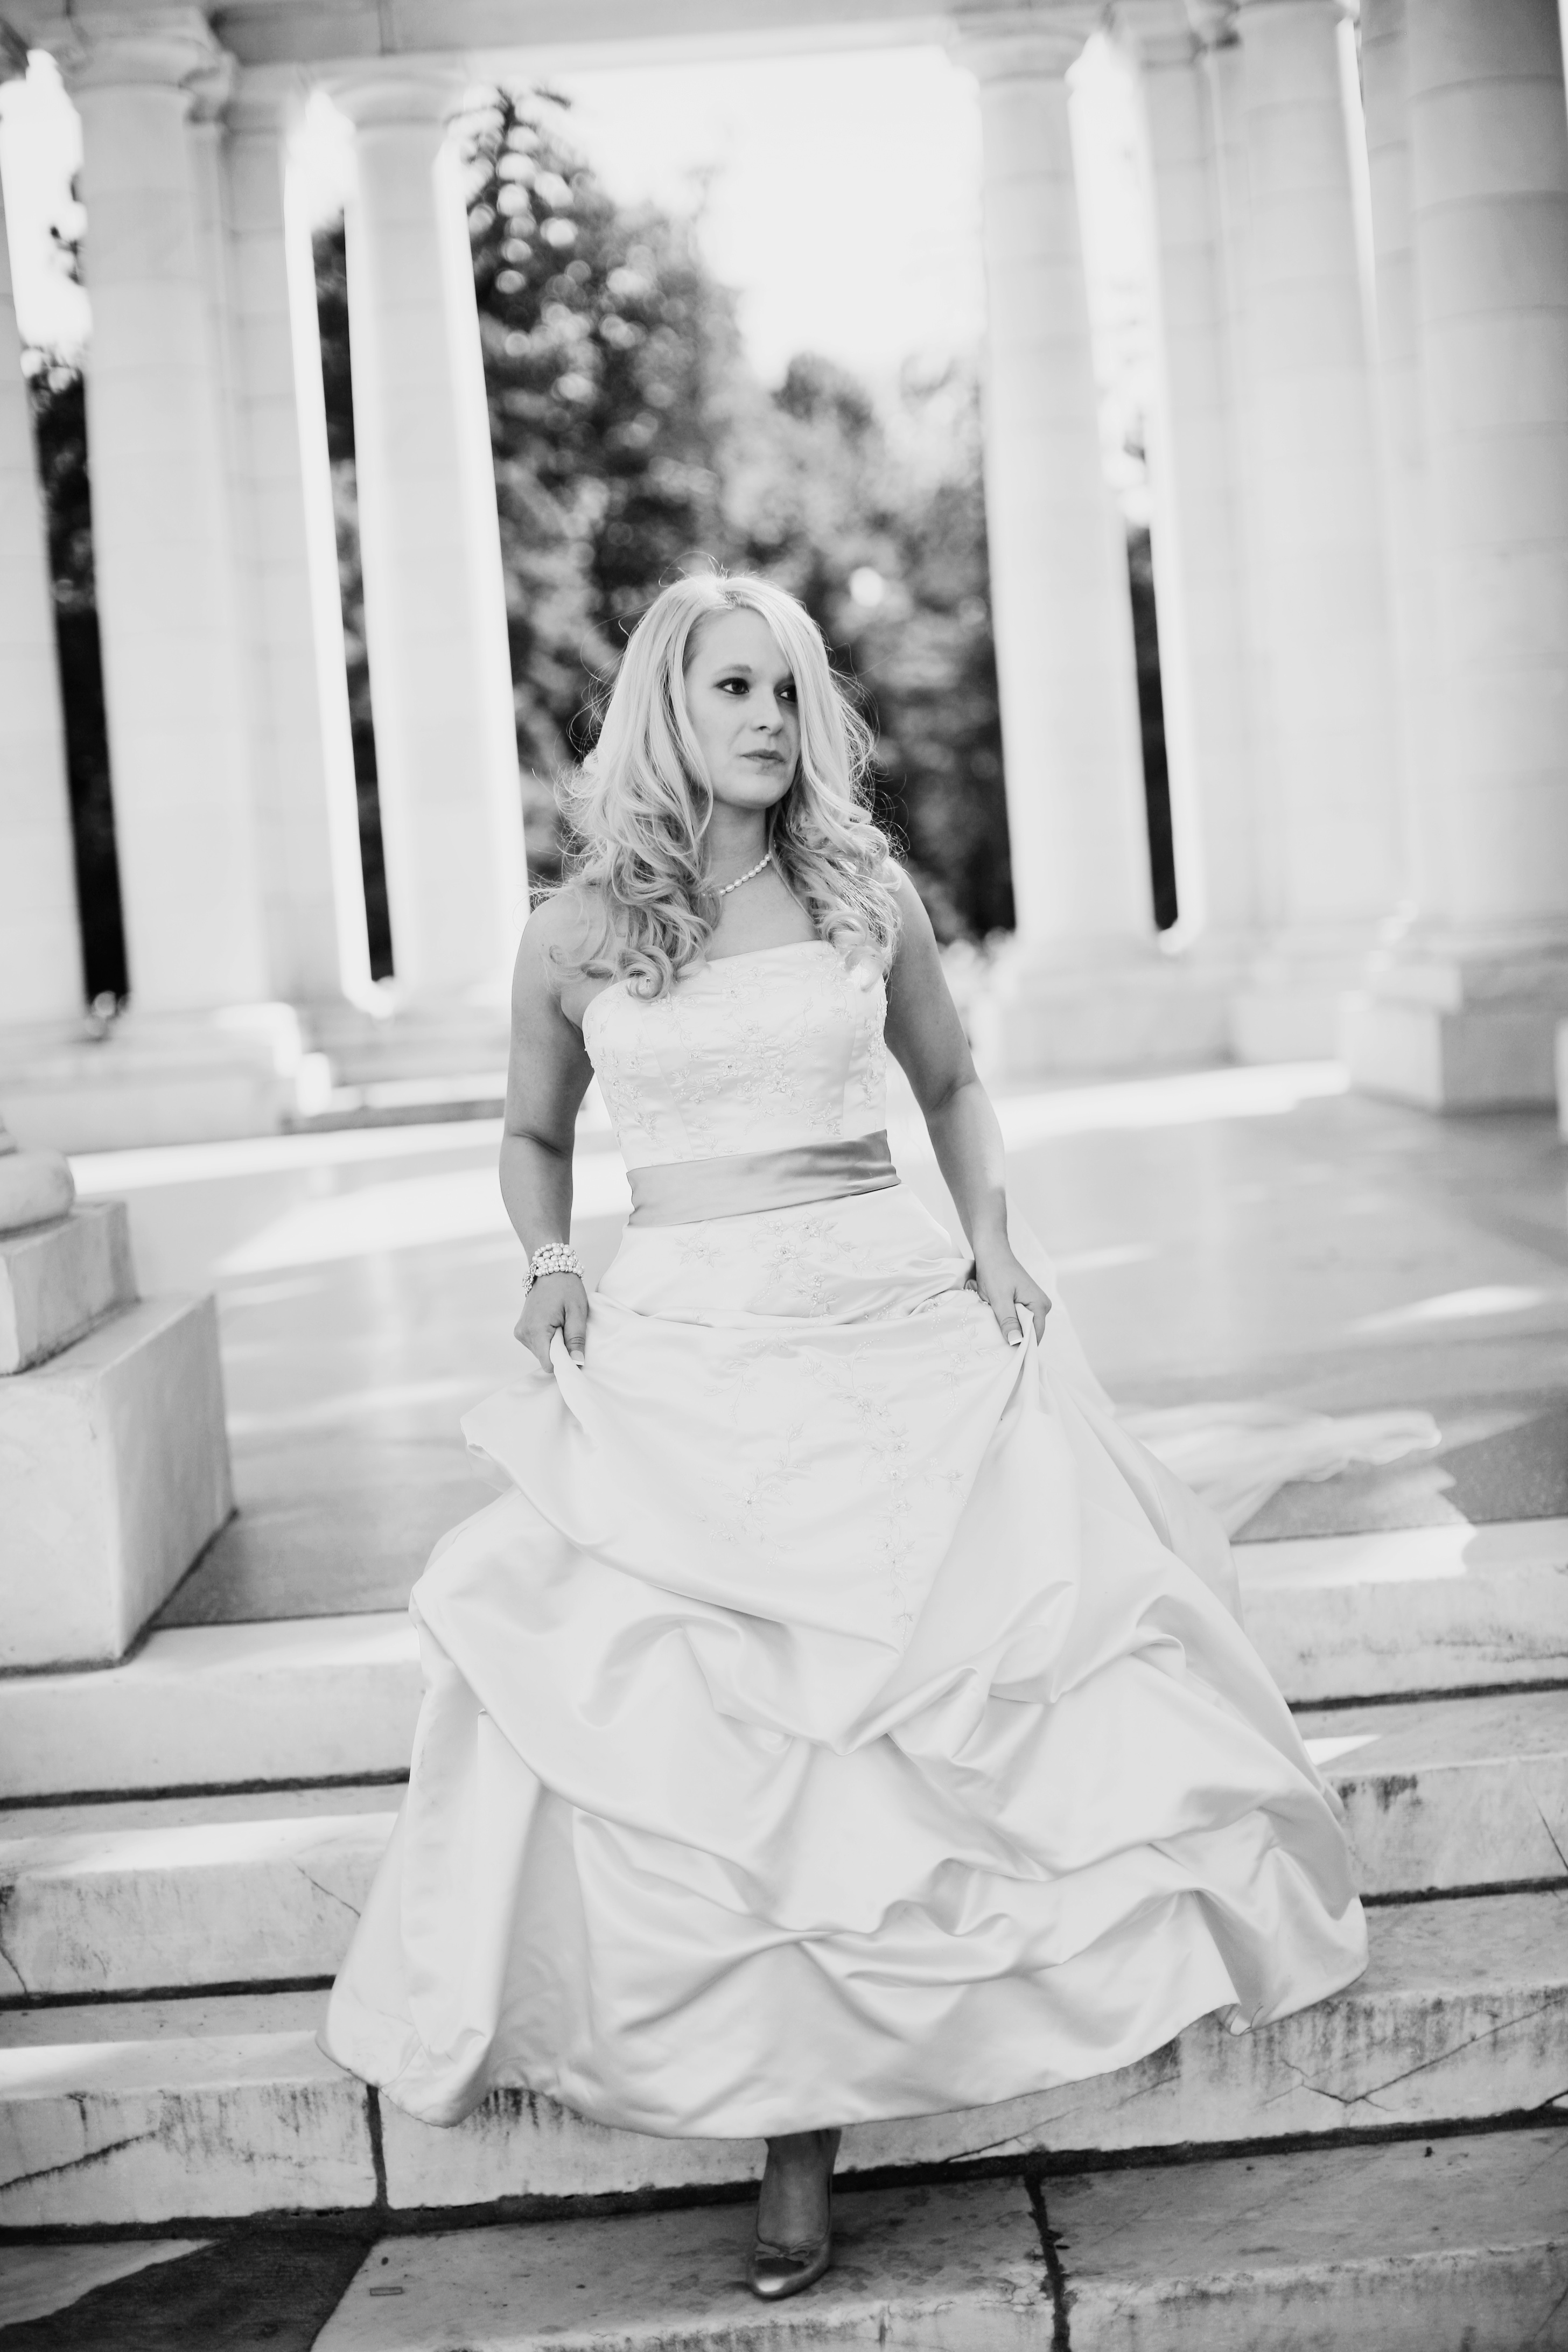 Wedding Dresses, Fashion, white, black, dress, The, Rock